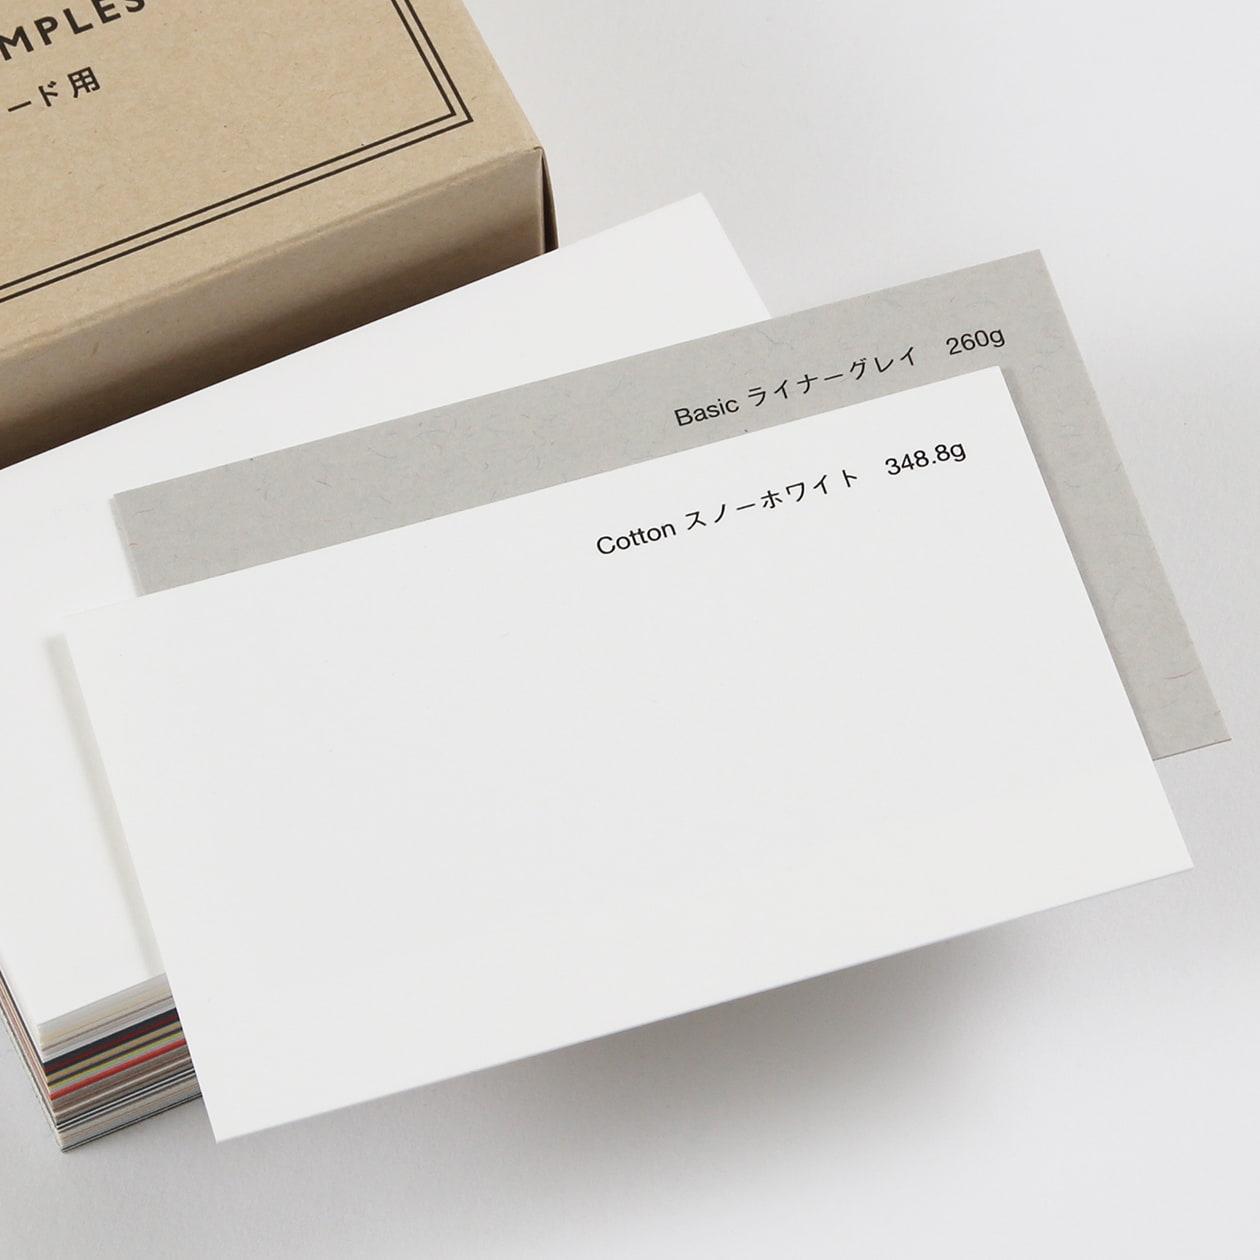 PAPER SAMPLES(ネームカード用)